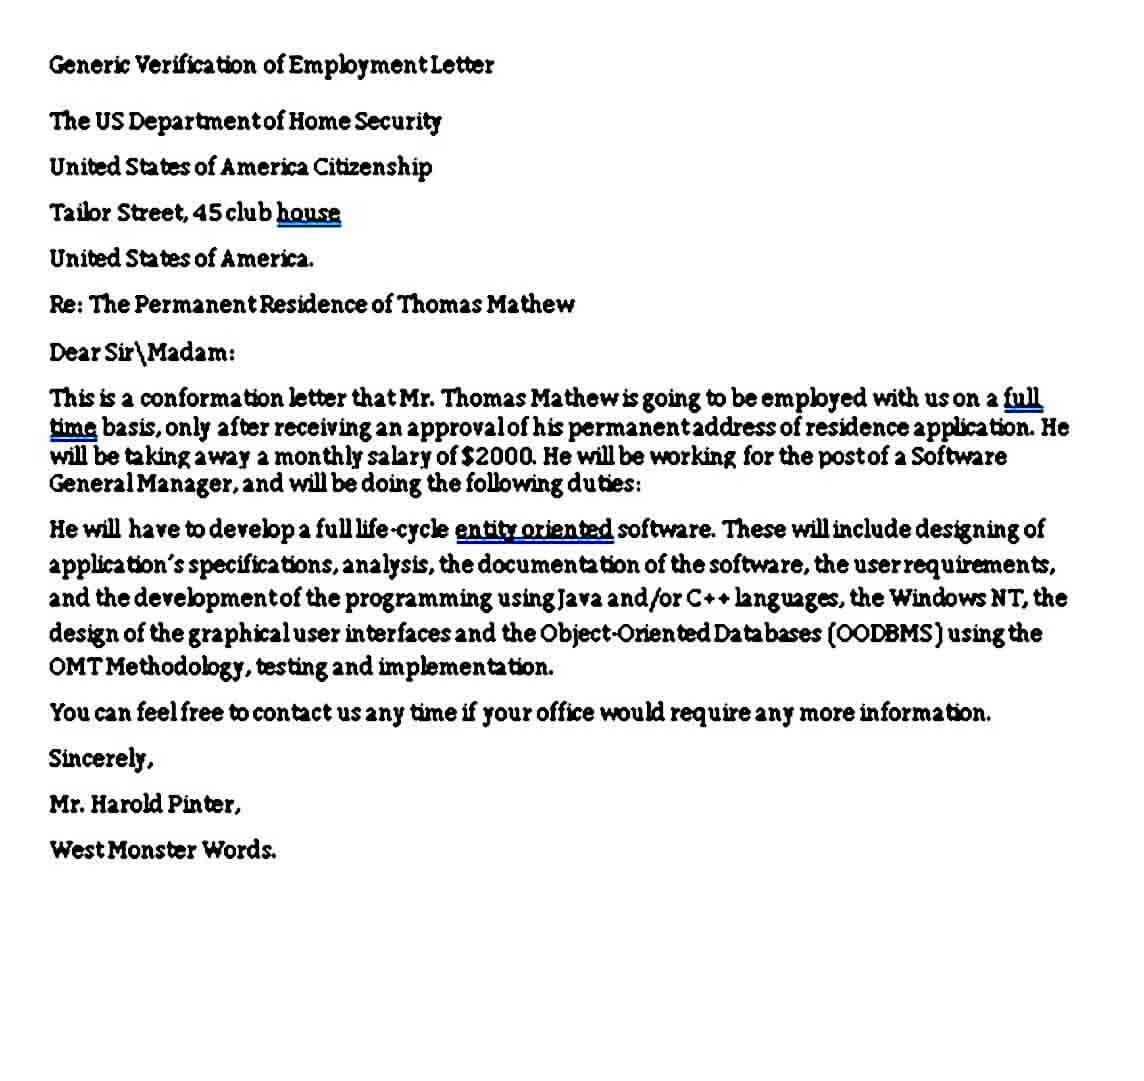 Generic Verification of Employment Letter